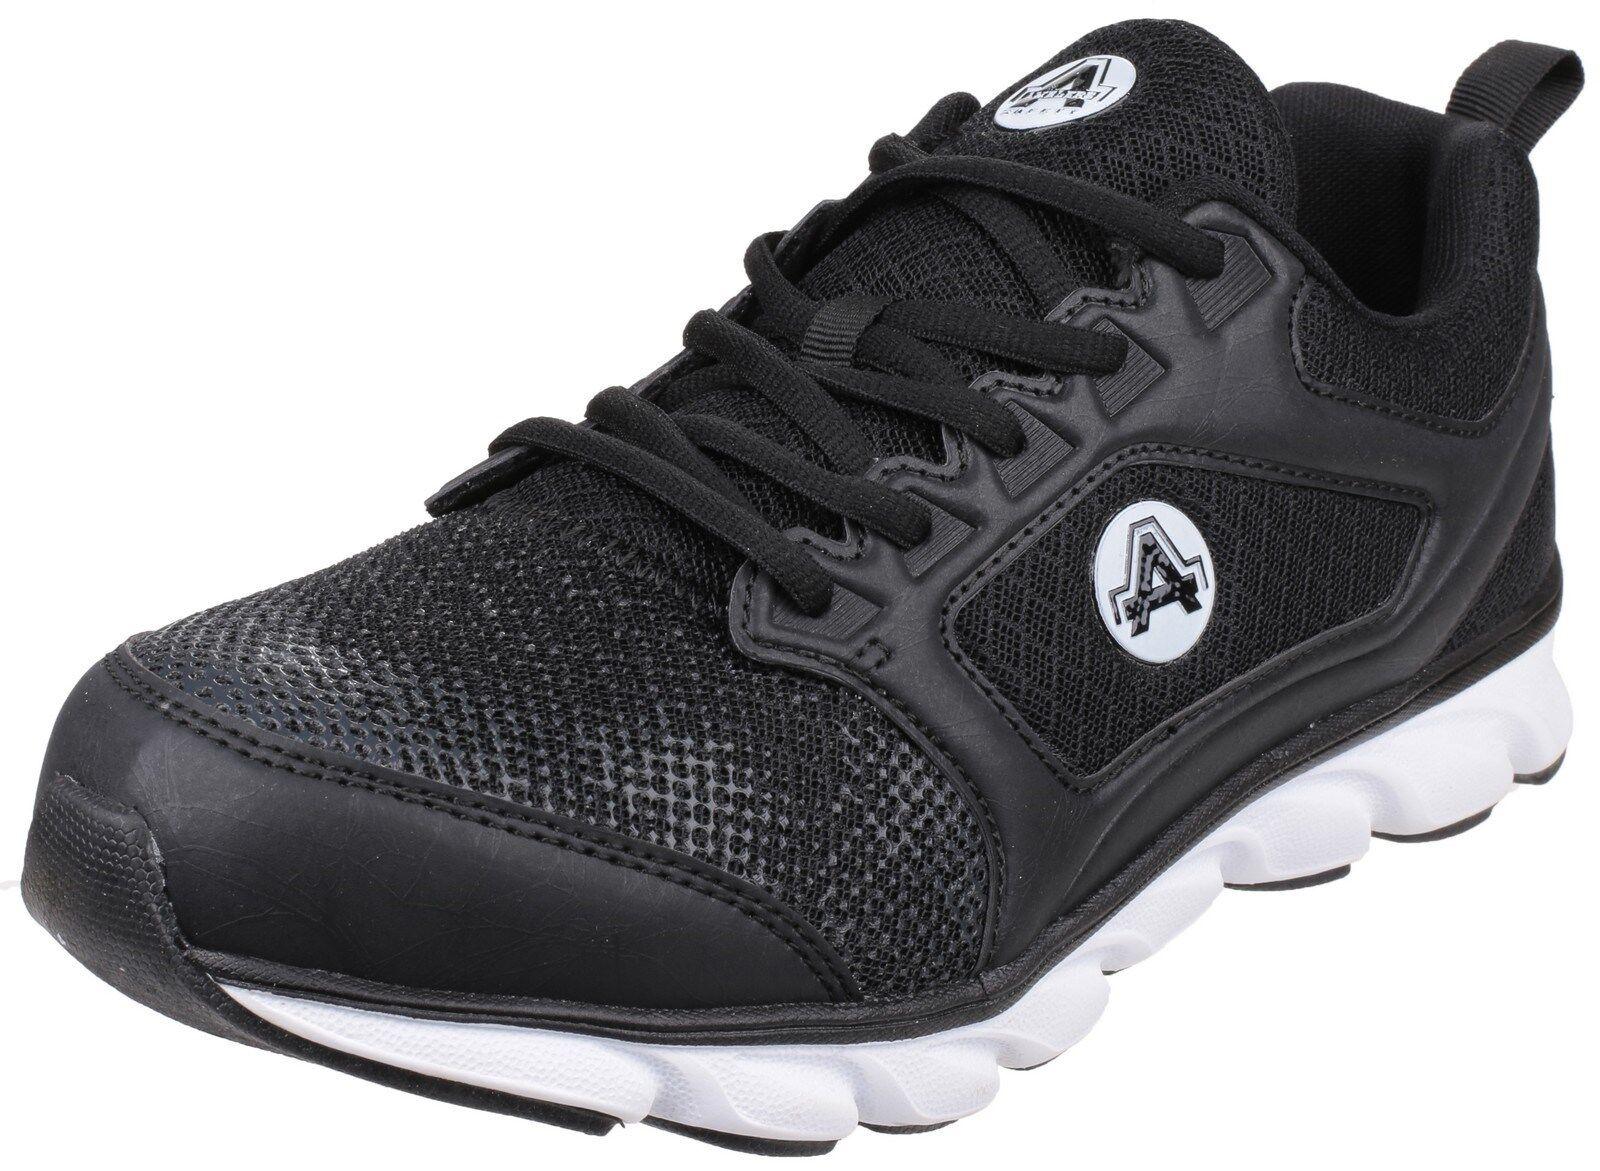 Amblers AS707 Kyanite scarpe da ginnastica da leggero leggero da non in Pelle Scarpe Sportive Da Uomo 3ece75